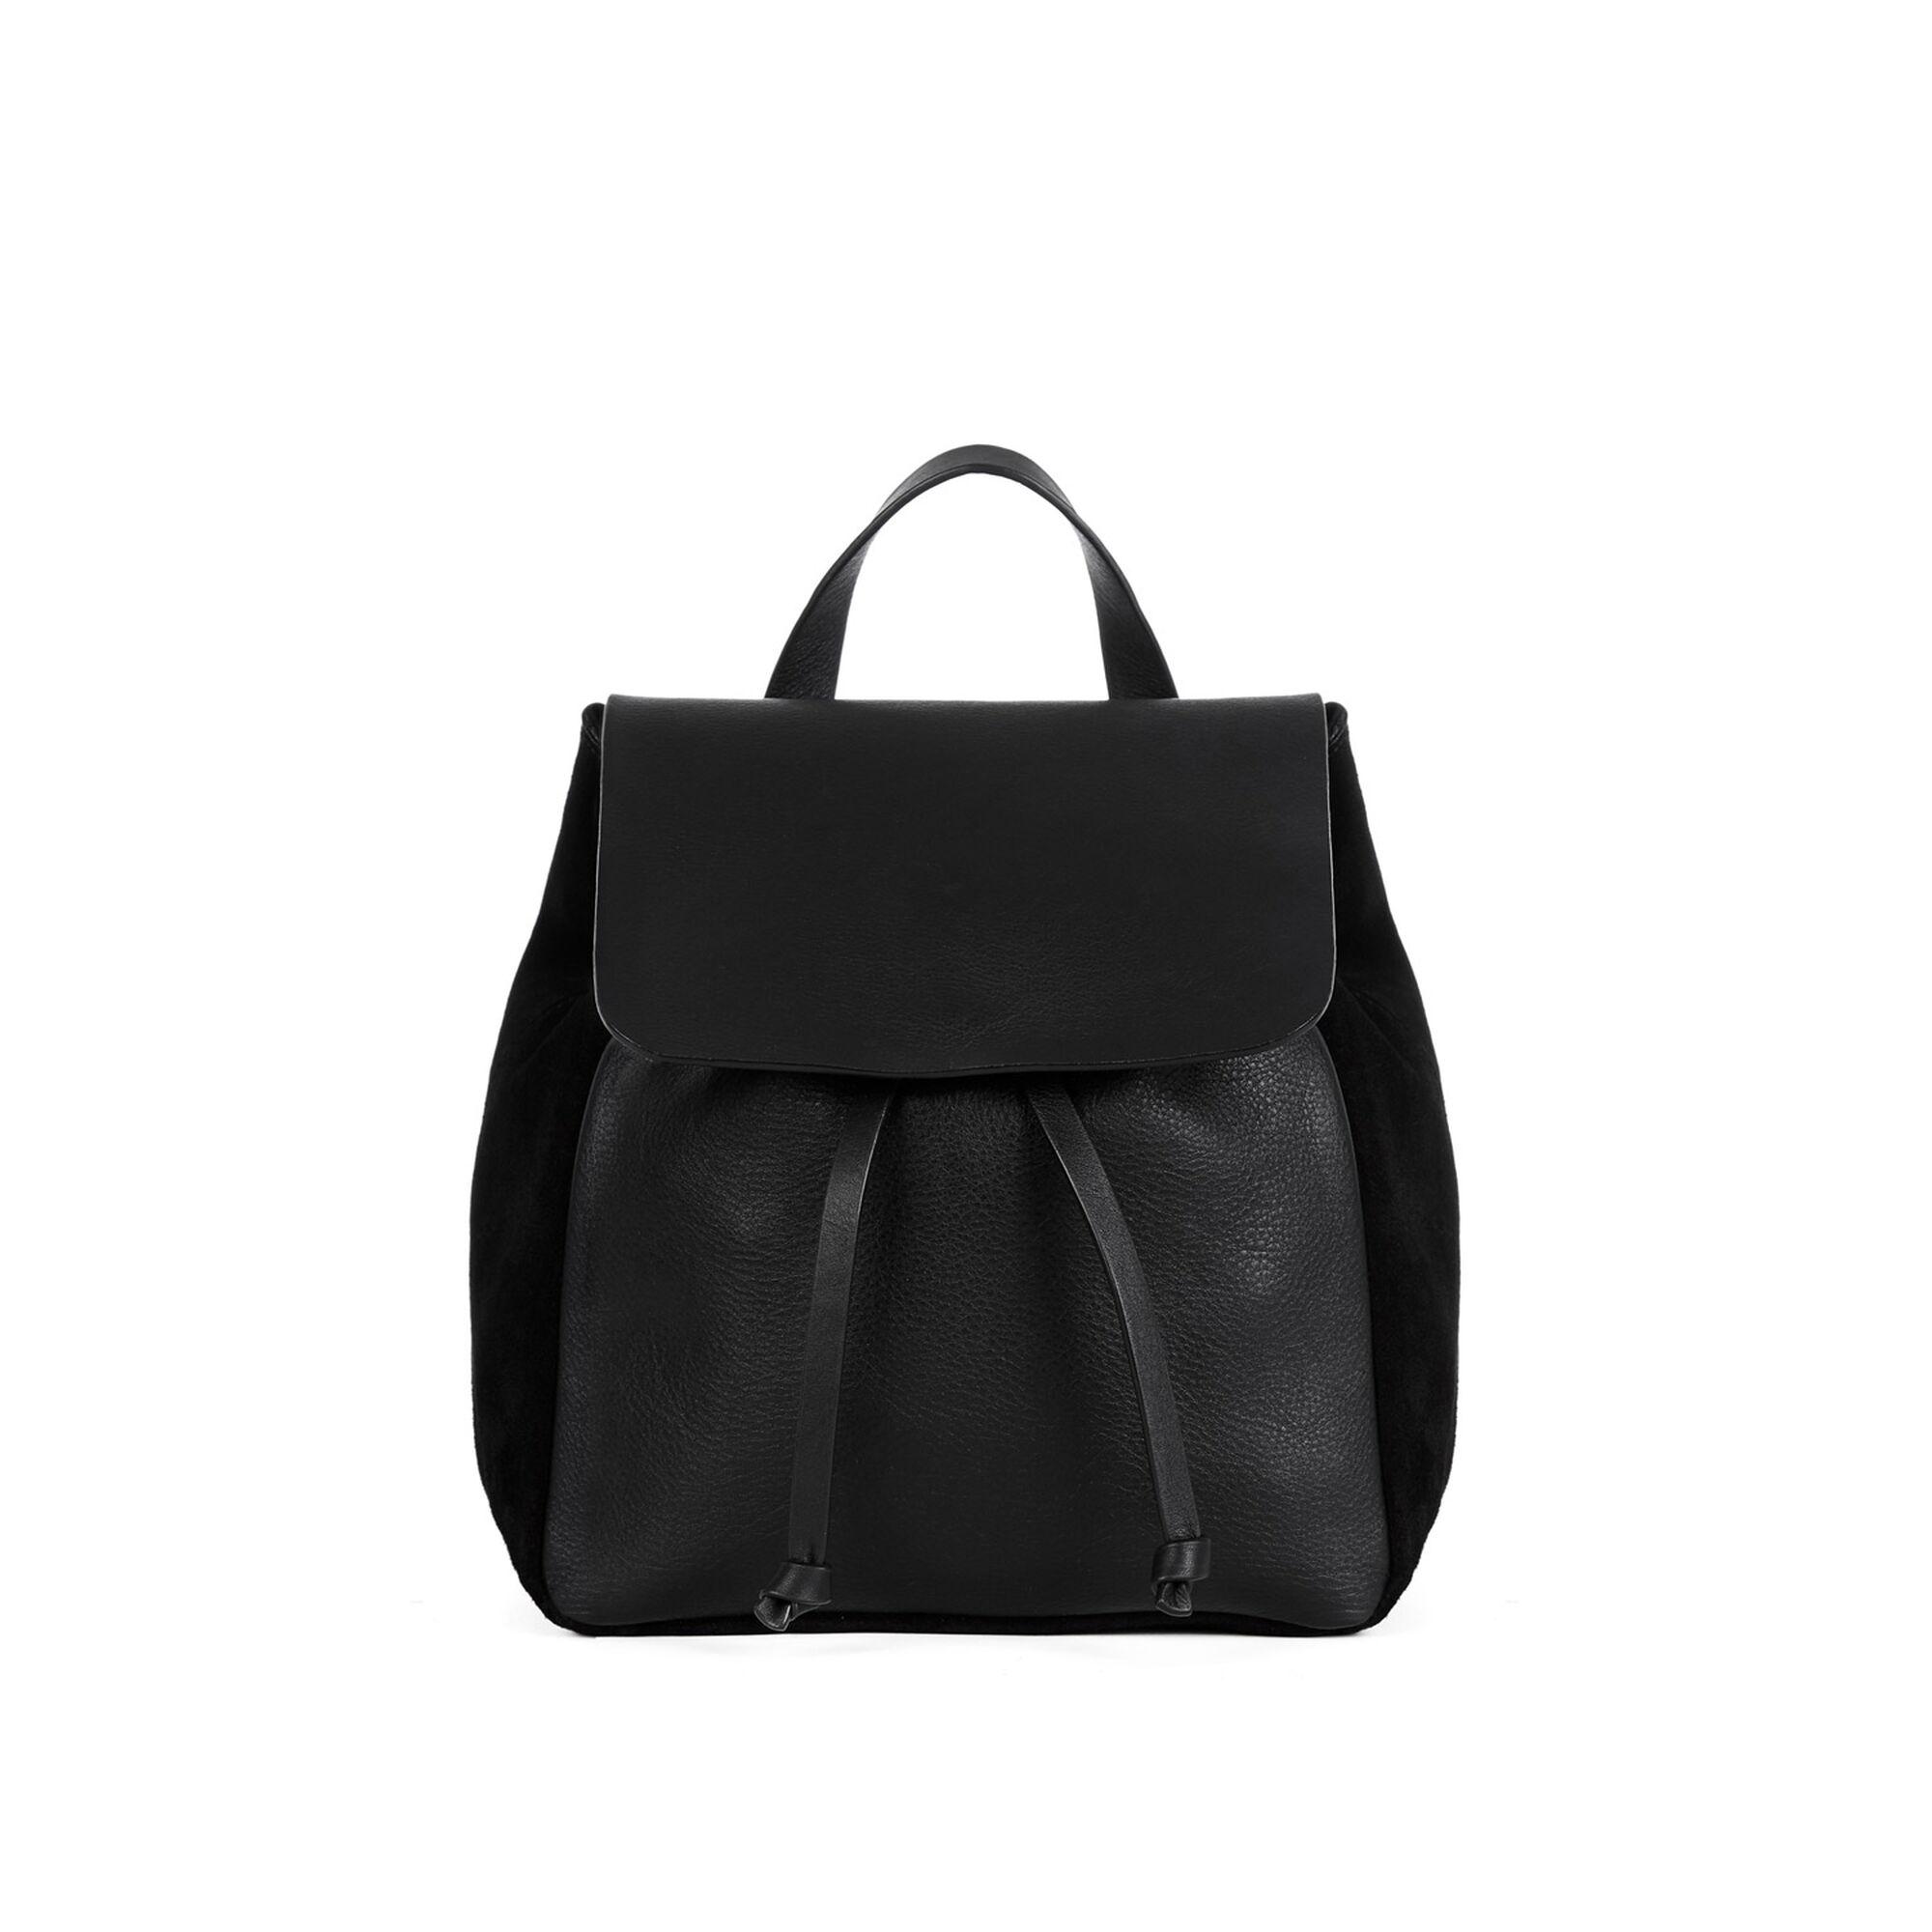 Warehouse, Leather Suede Mini Rucksack Black 1